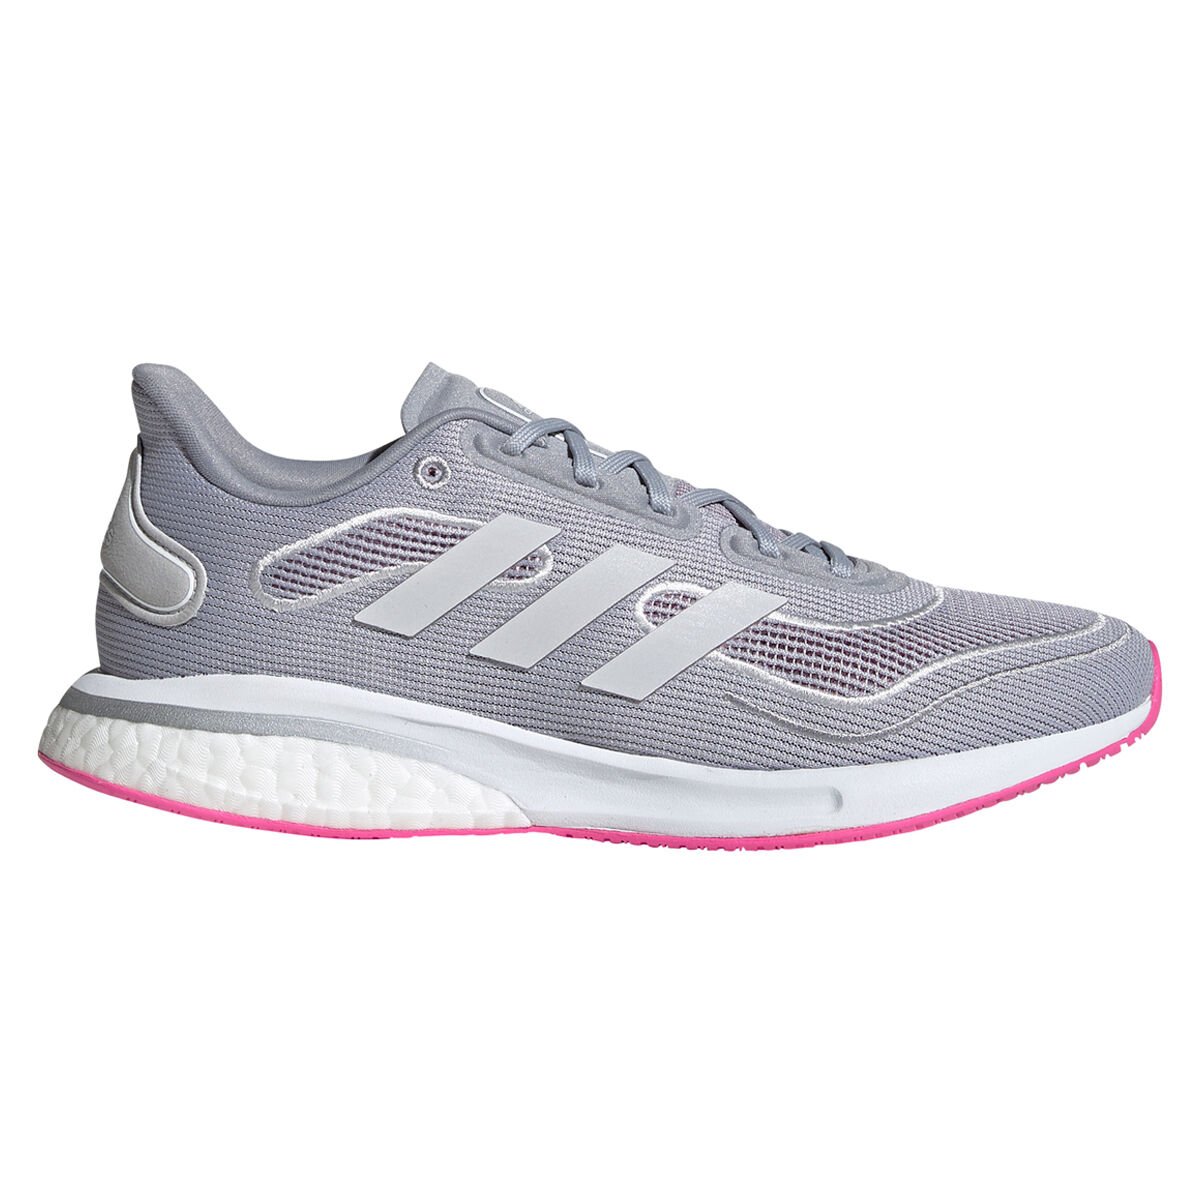 nike free run 3.0 hot punch cheap for girls | adidas Supernova Womens Running Shoes